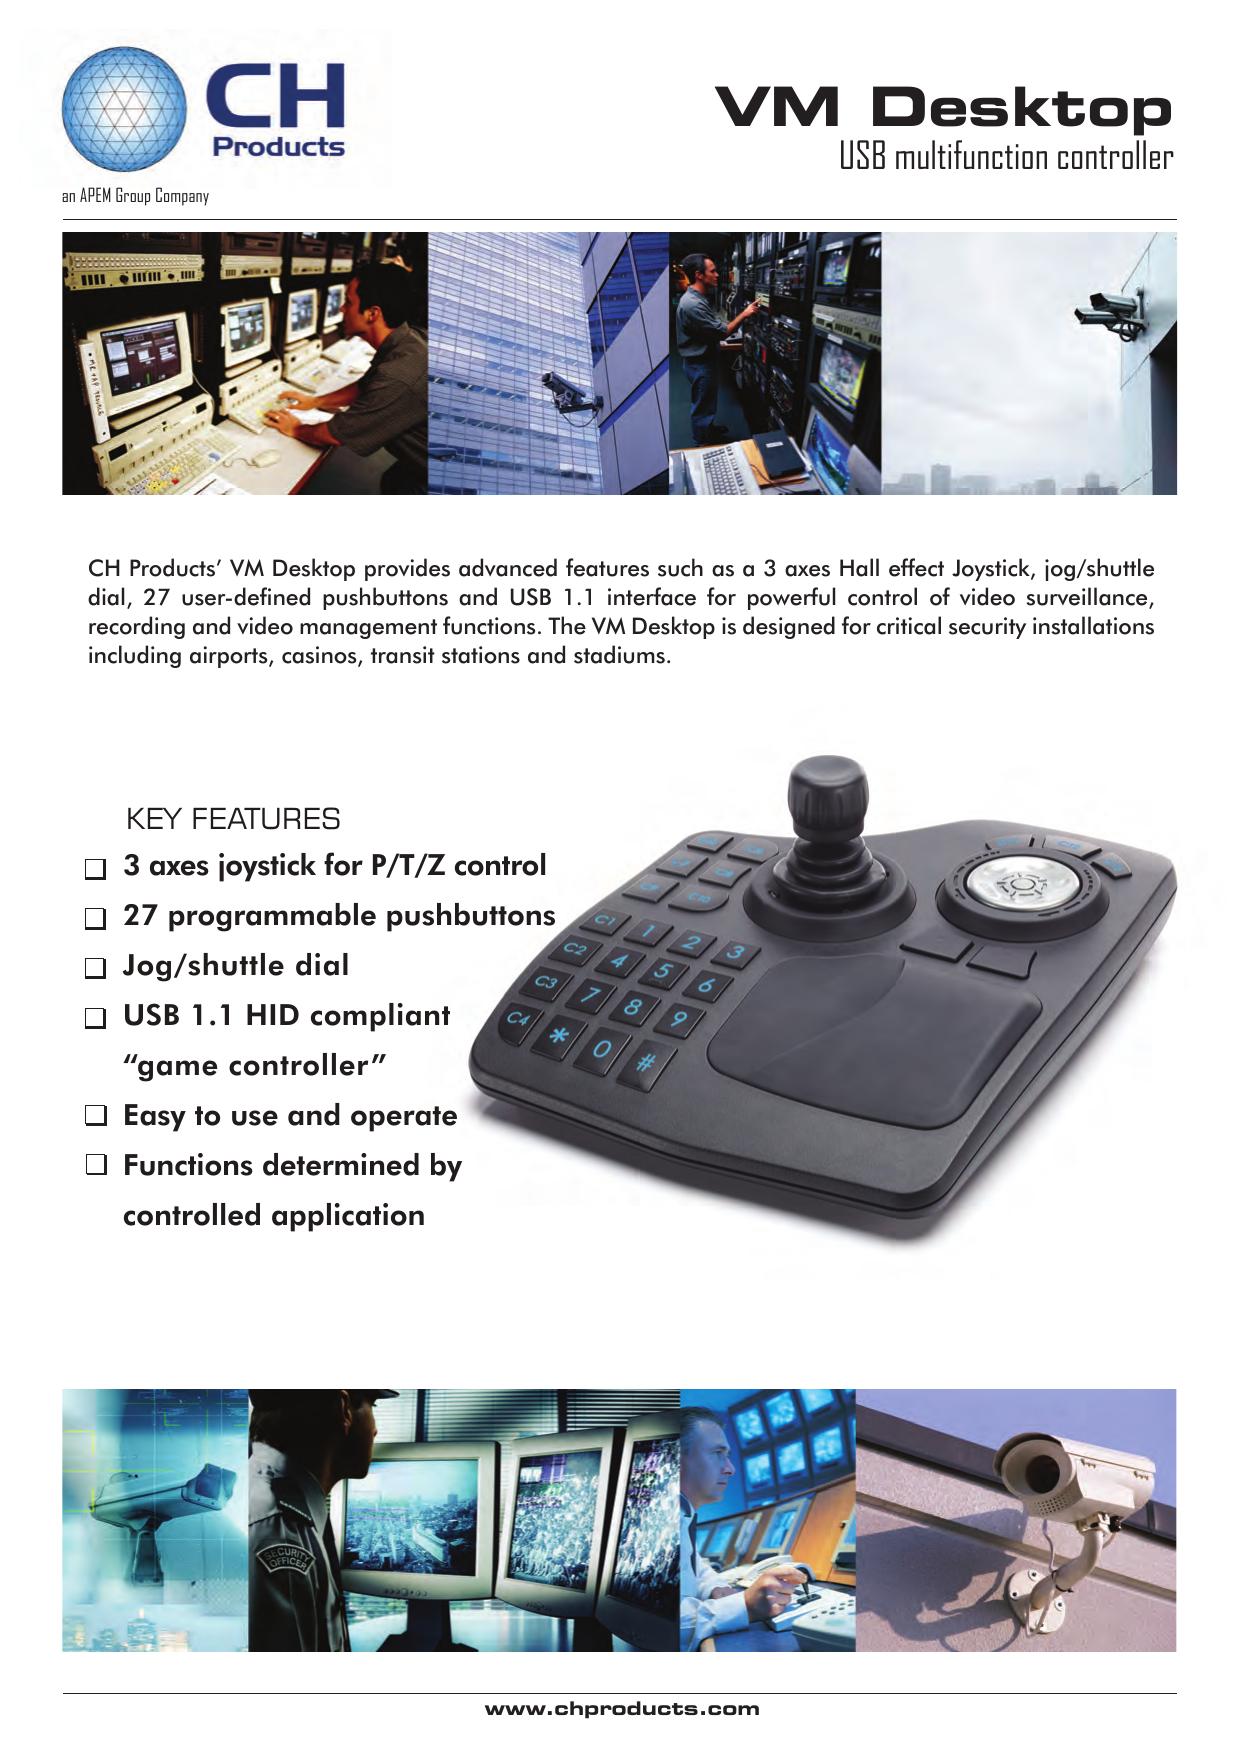 VM Desktop - Mouser Electronics | manualzz com